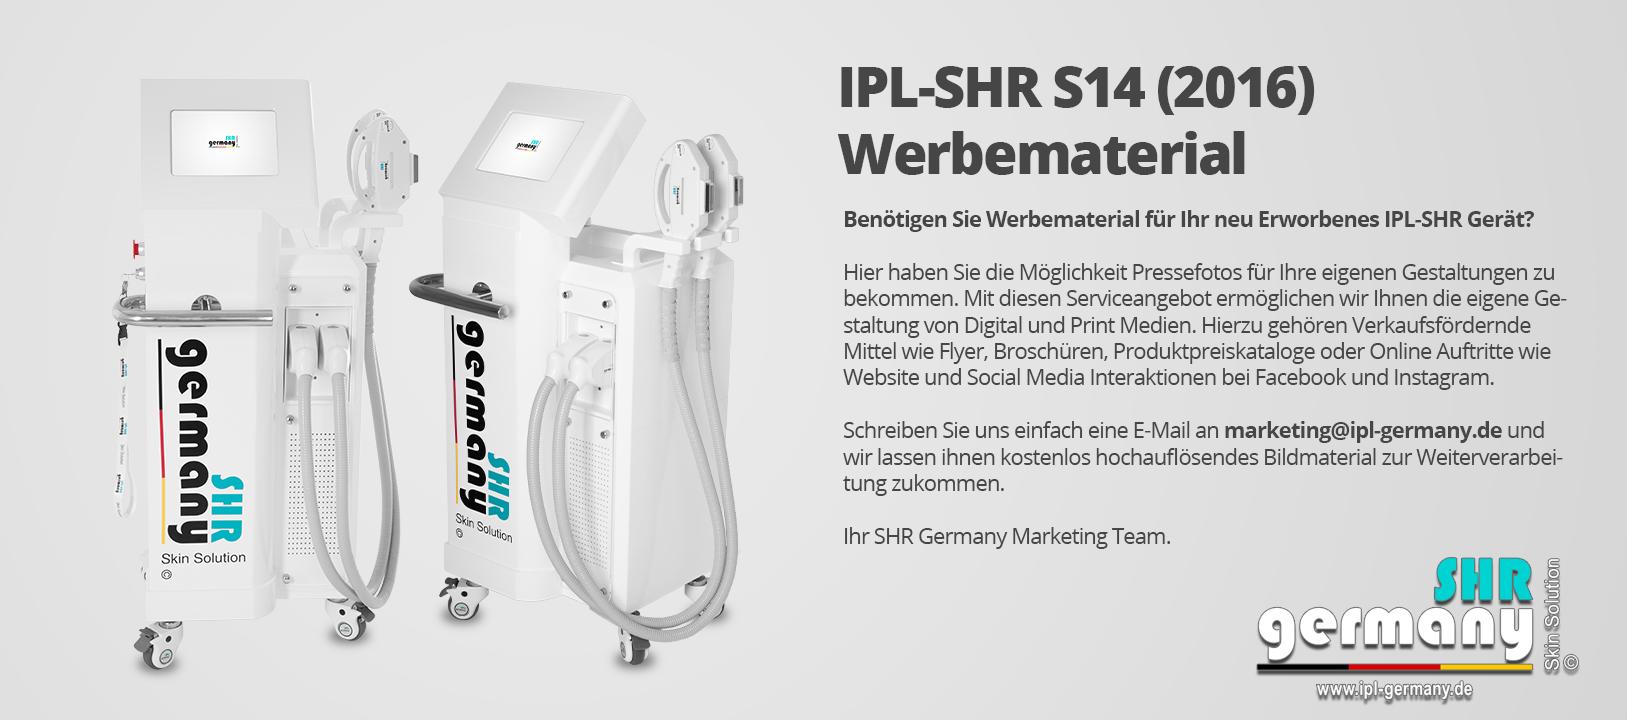 SHR-Germany_PMU_S14_Werbematerial_2016